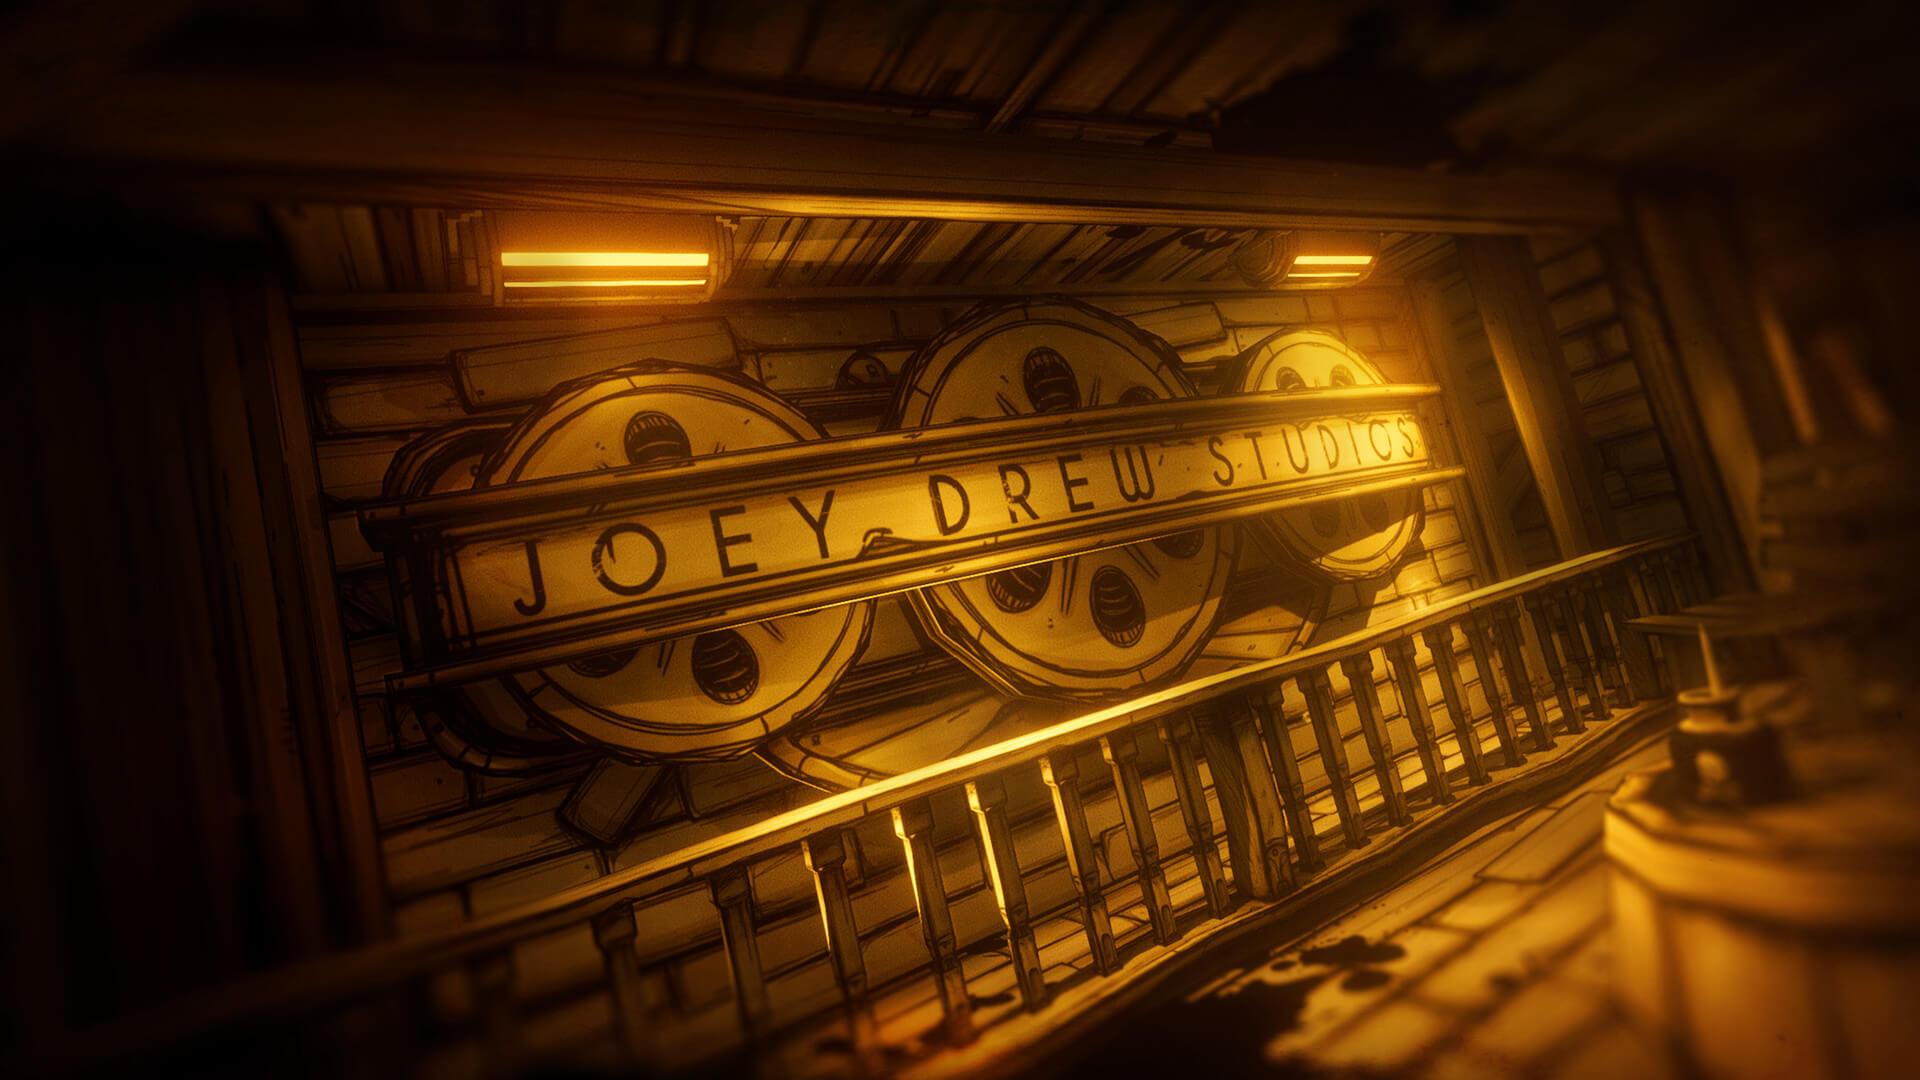 Bendy and the ink machine hikayeli oyun